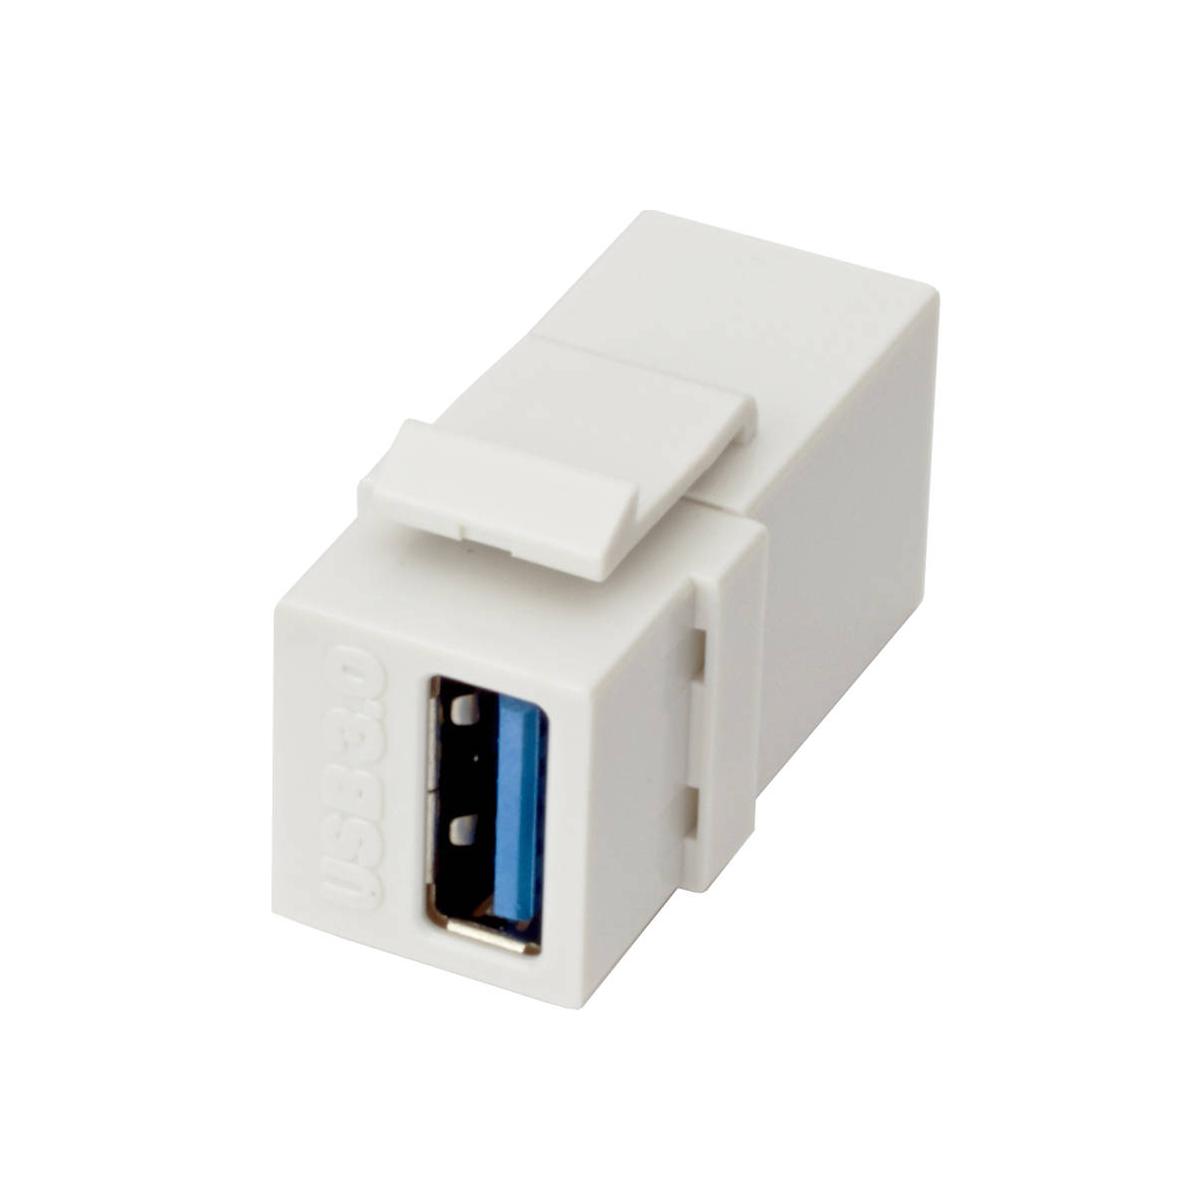 Excel 1PT USB 3.0 Keystone Adaptor White